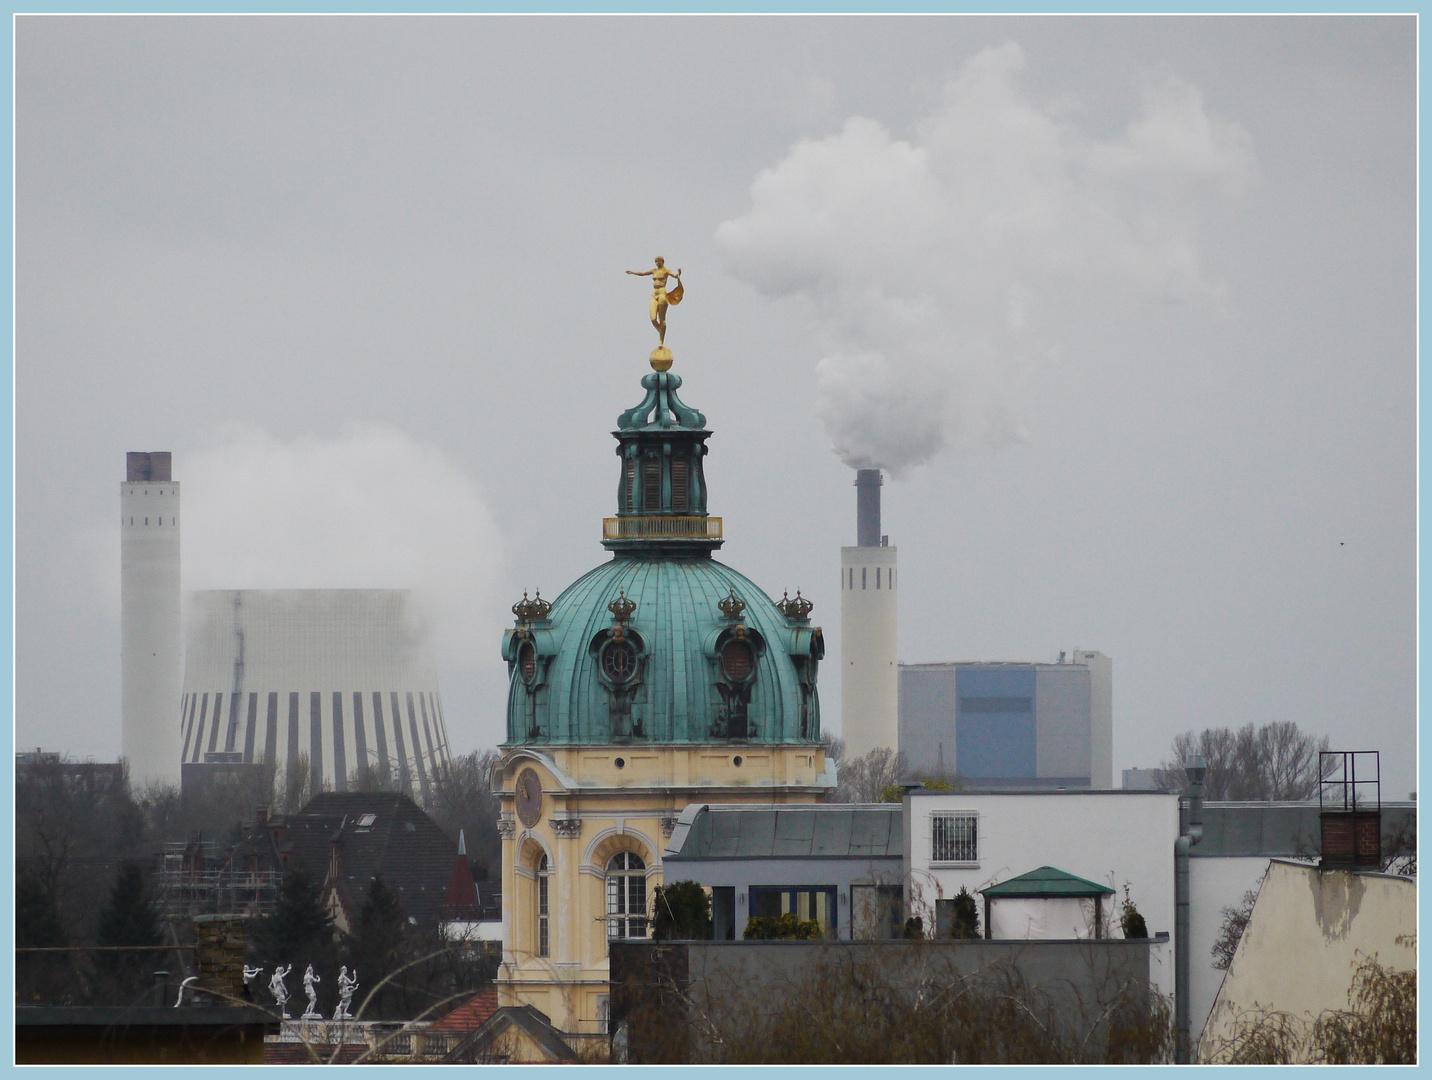 Schloss Charlottenburg, Berlin